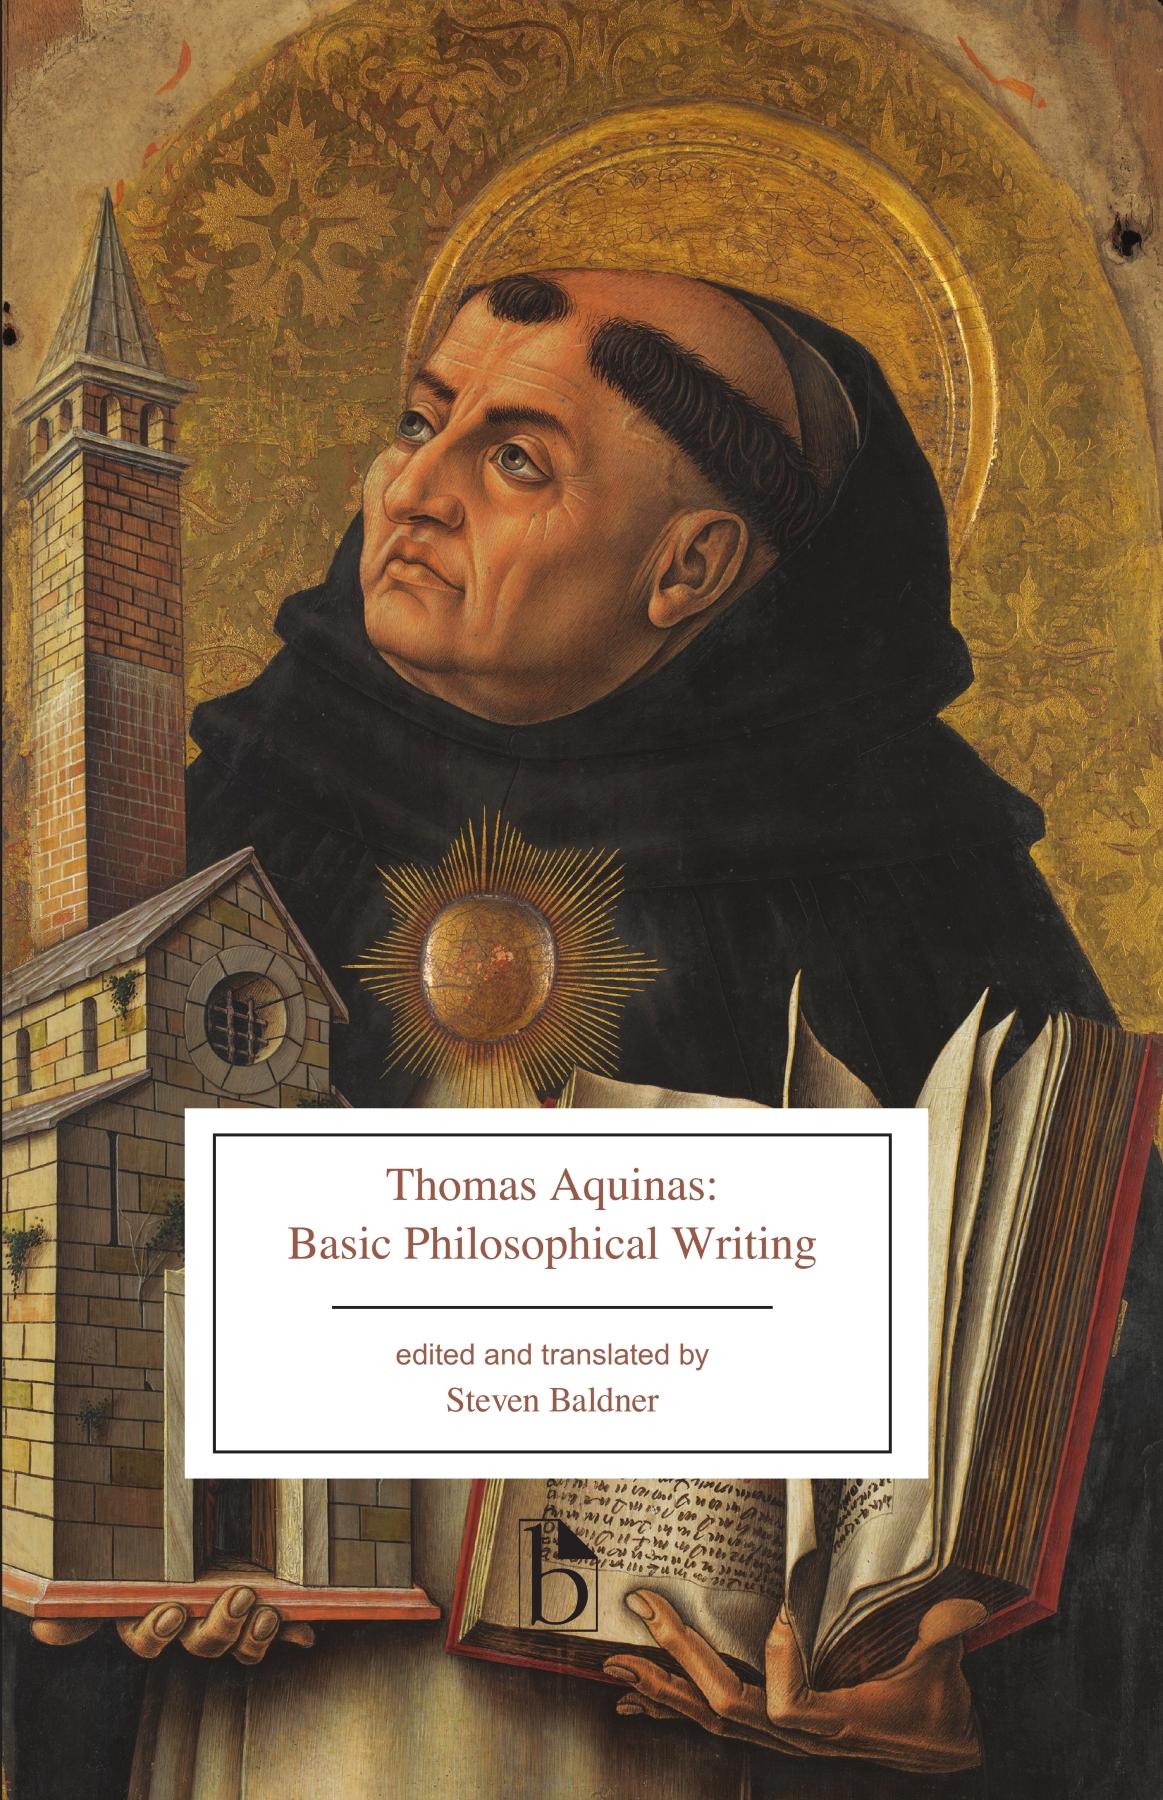 Writings (general remarks)